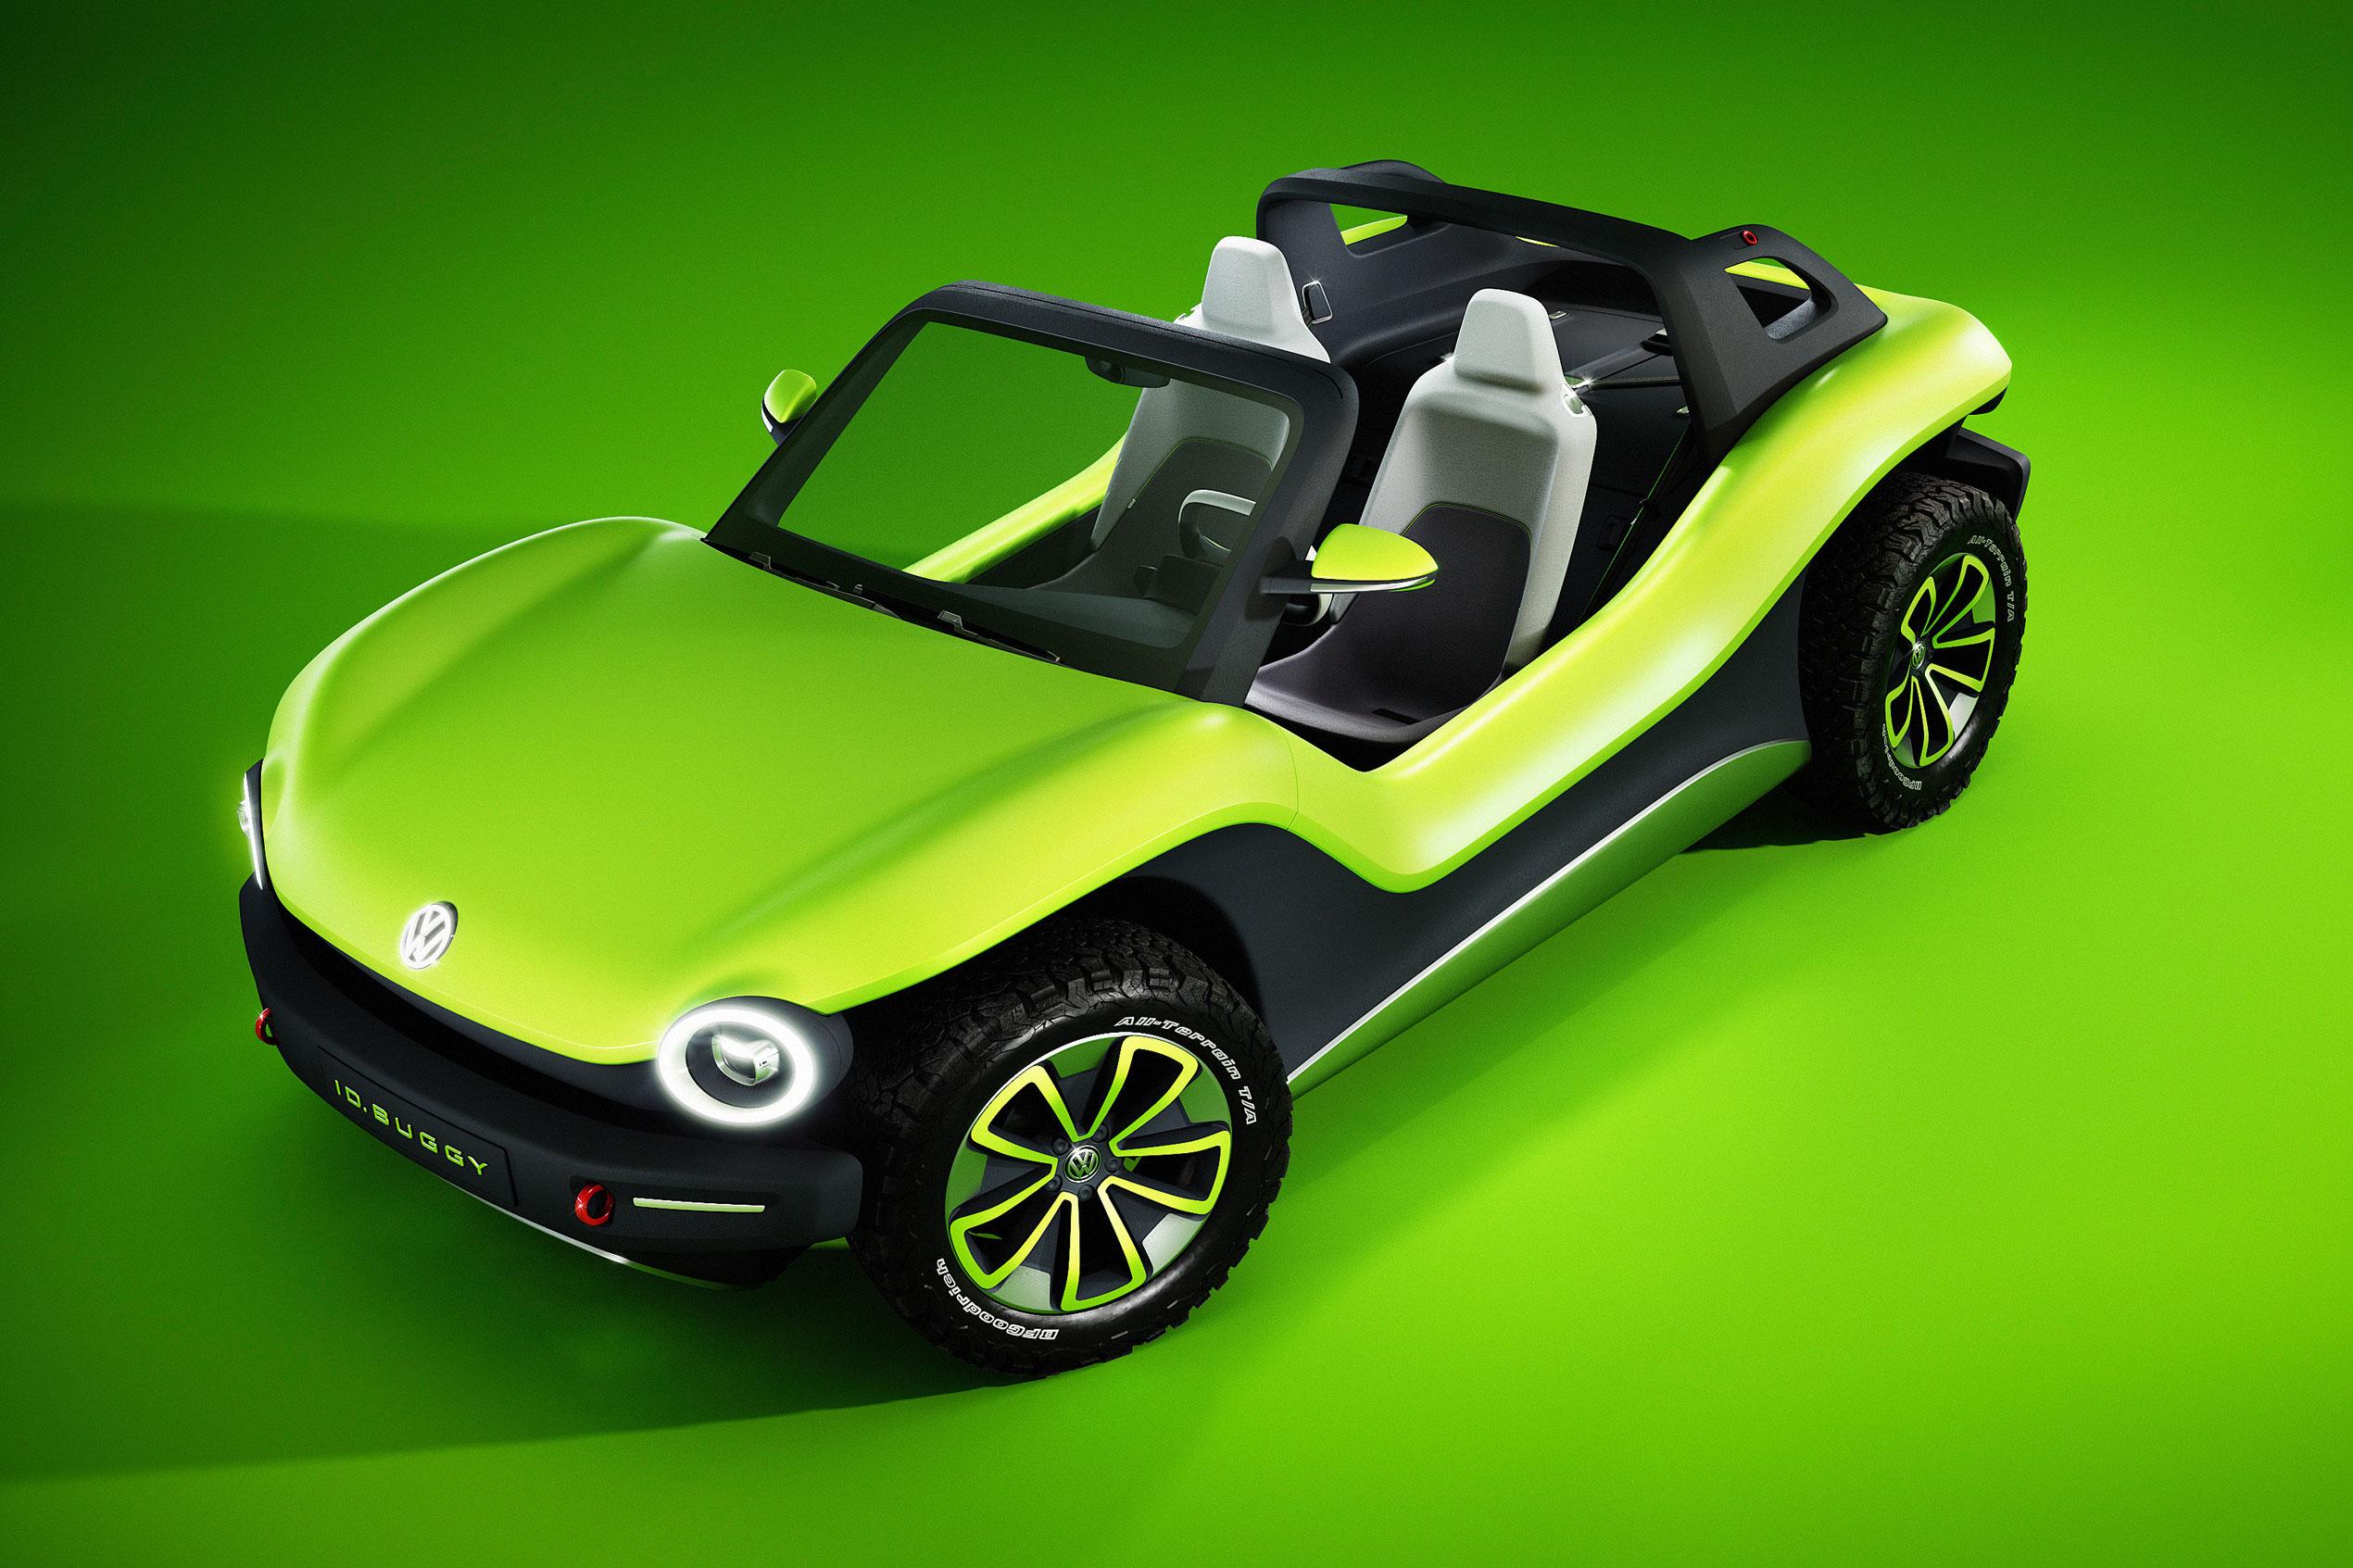 VW Dune Buggy top green